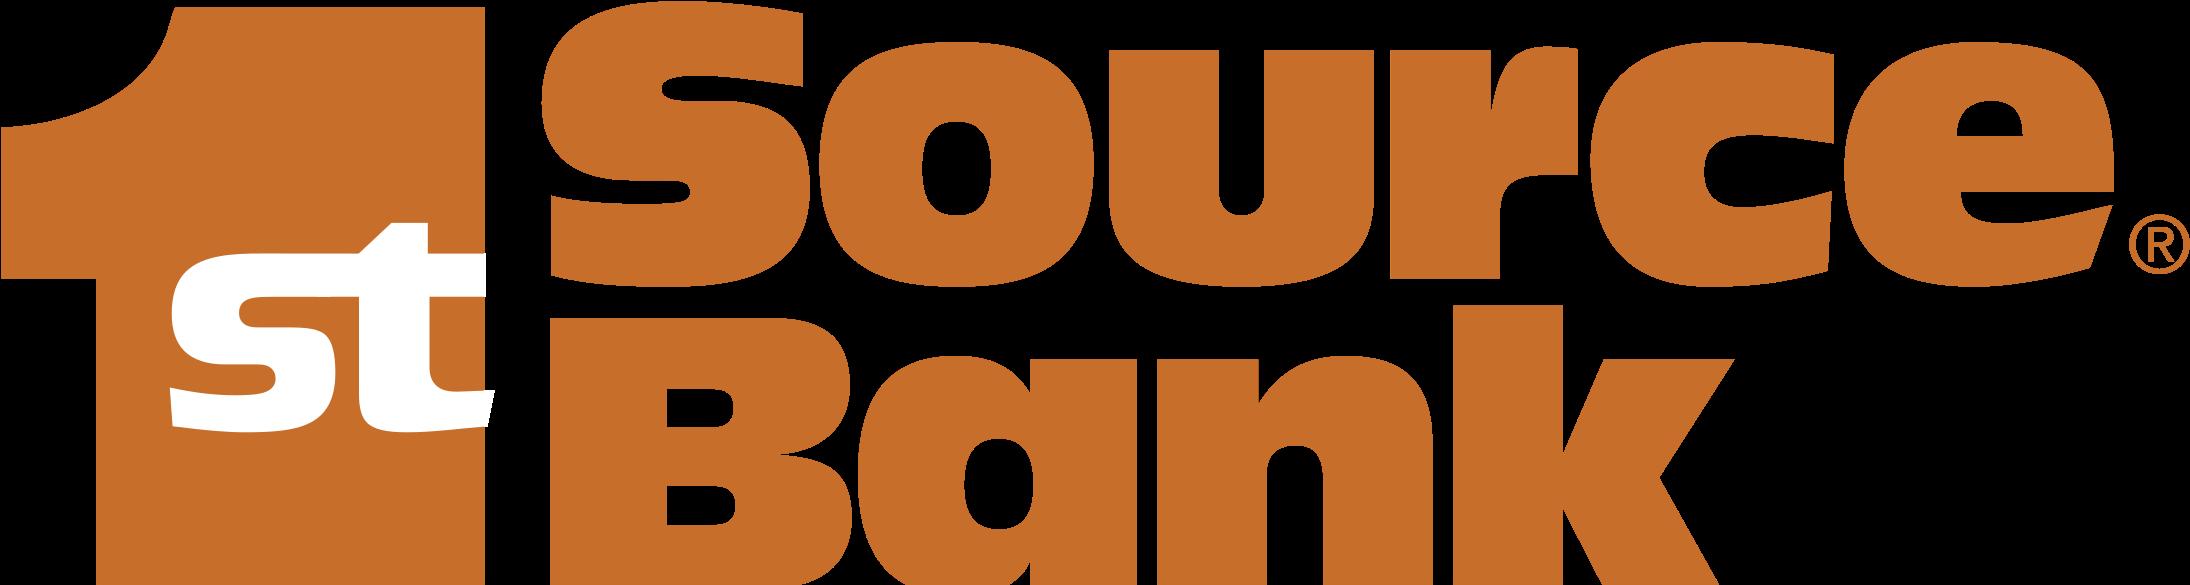 1st Source Bank Logo Png Transparent - 1st Source Bank Logo (2400x2400), Png Download